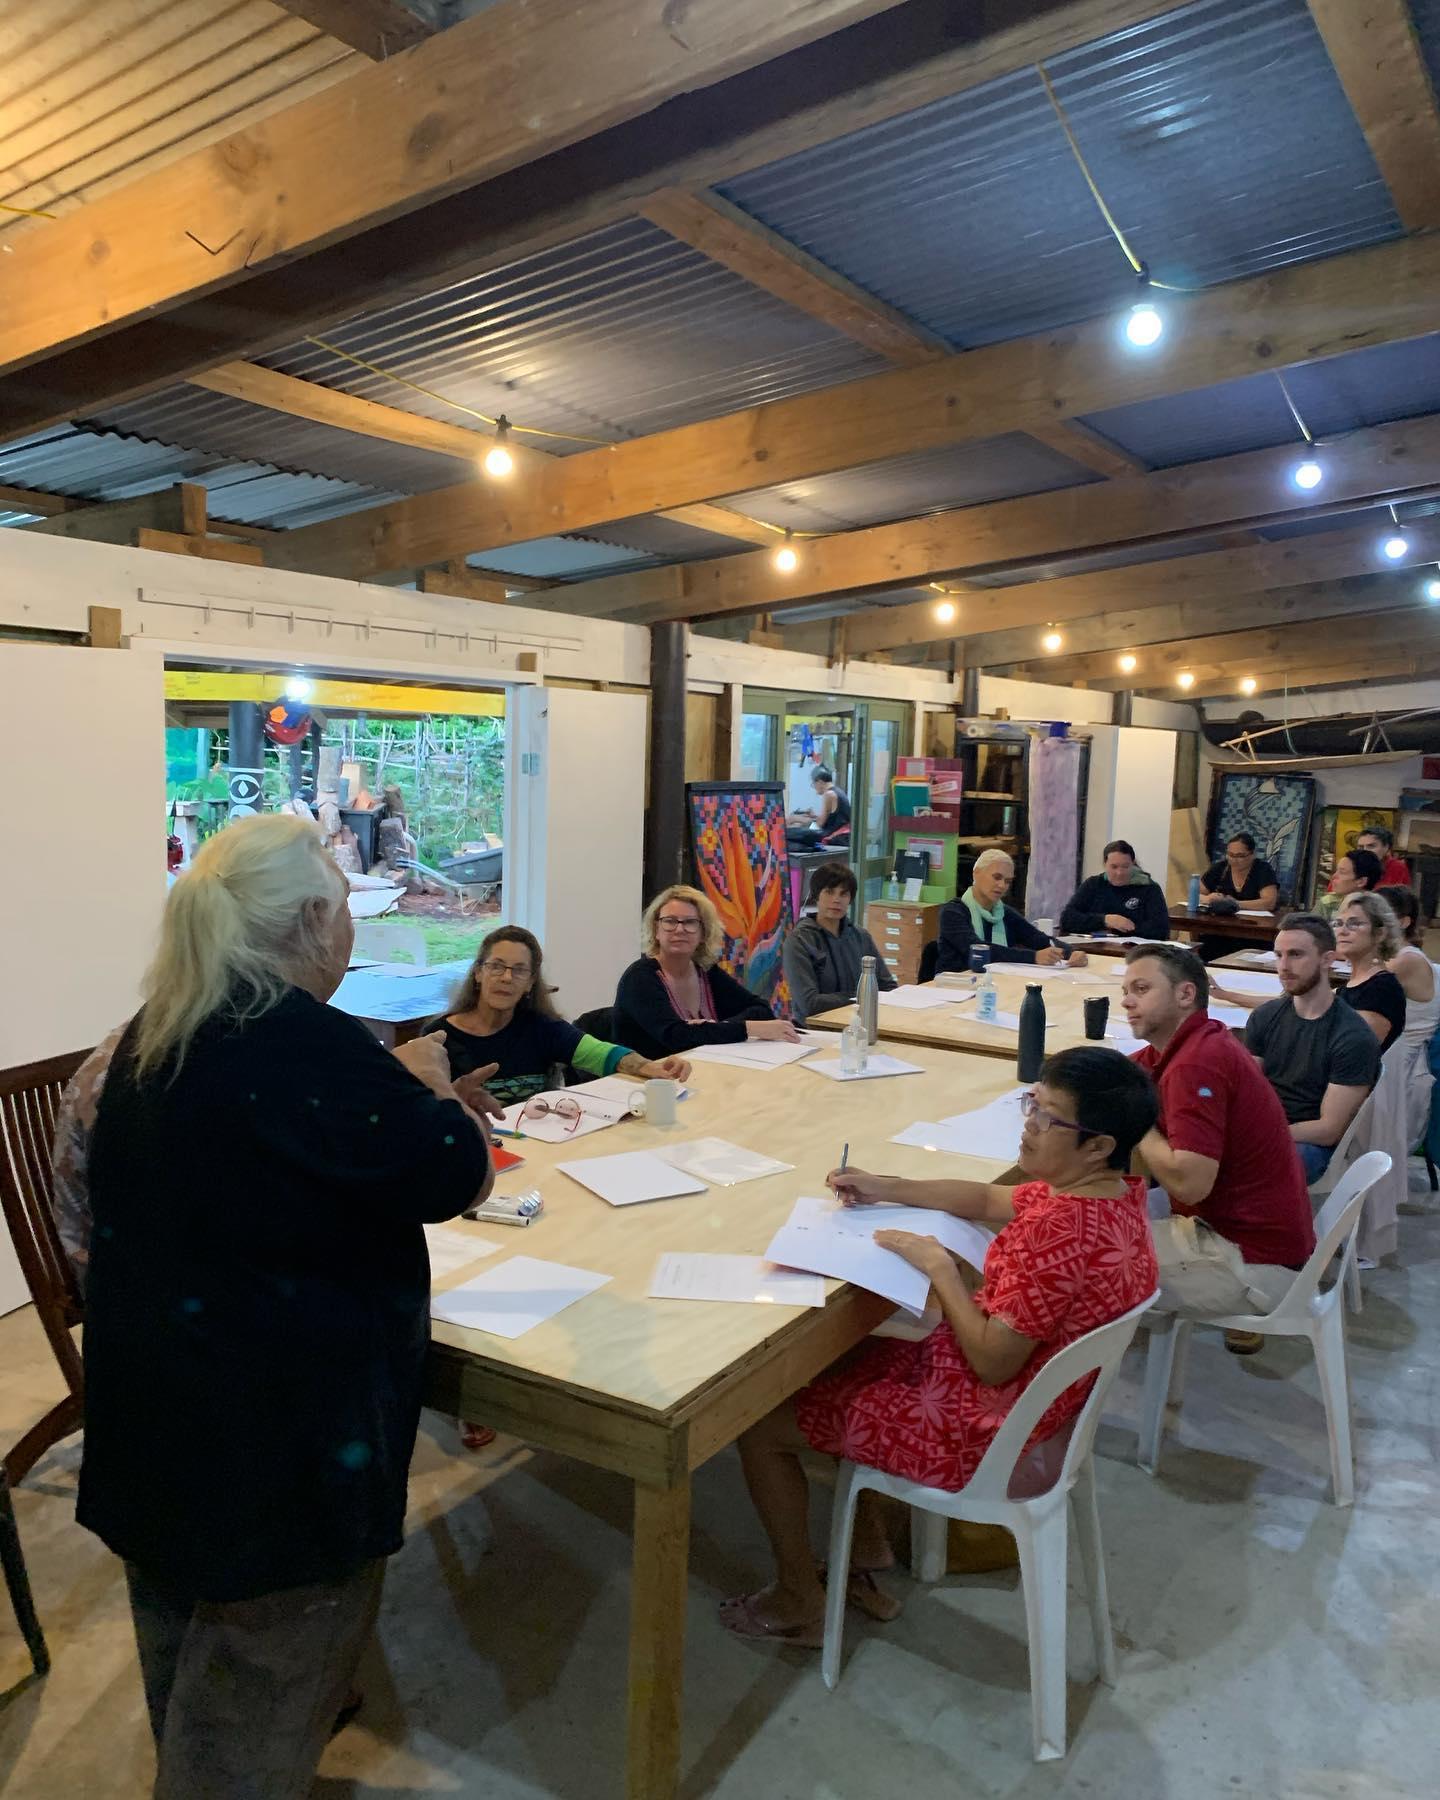 Everyday phrases  help Mike Tavioni teach Maori